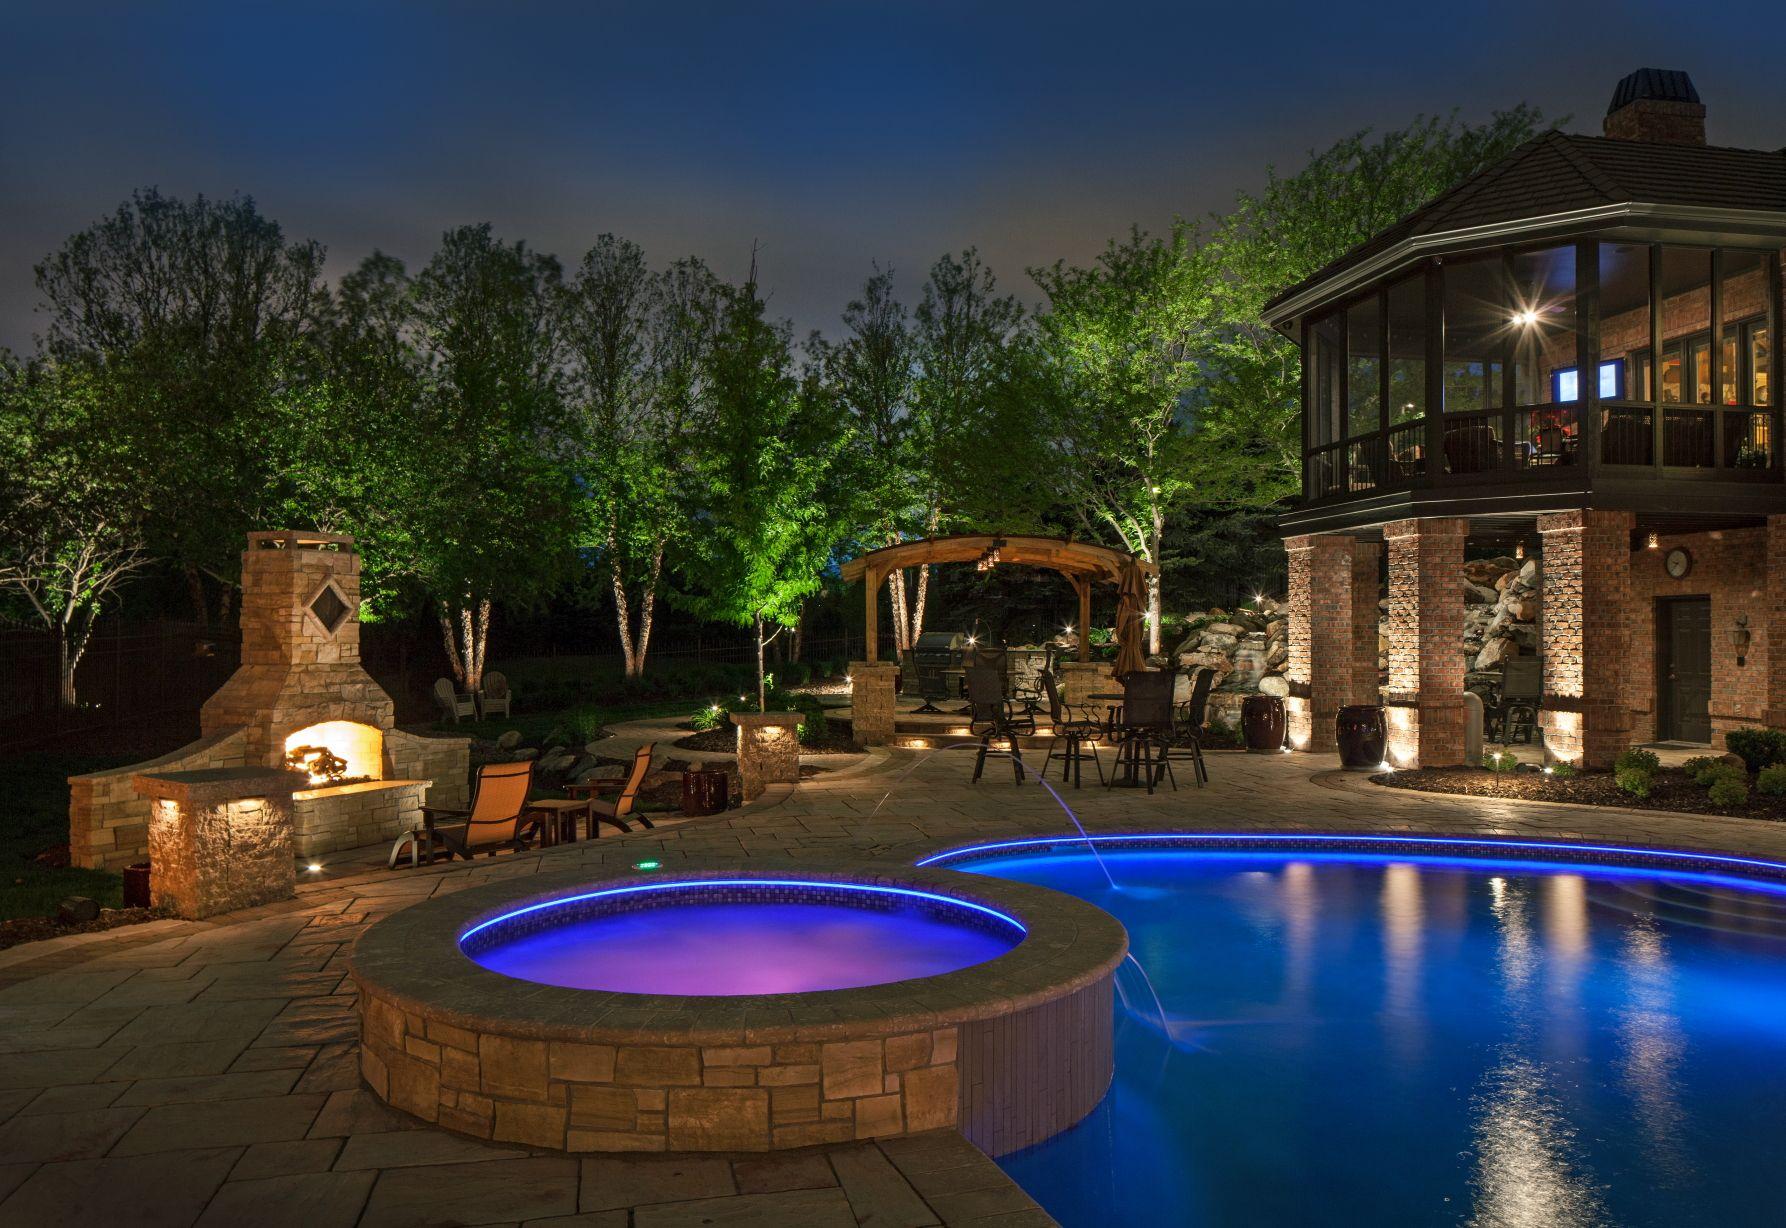 Pool Landscape Lighting Ideas Google Search Design